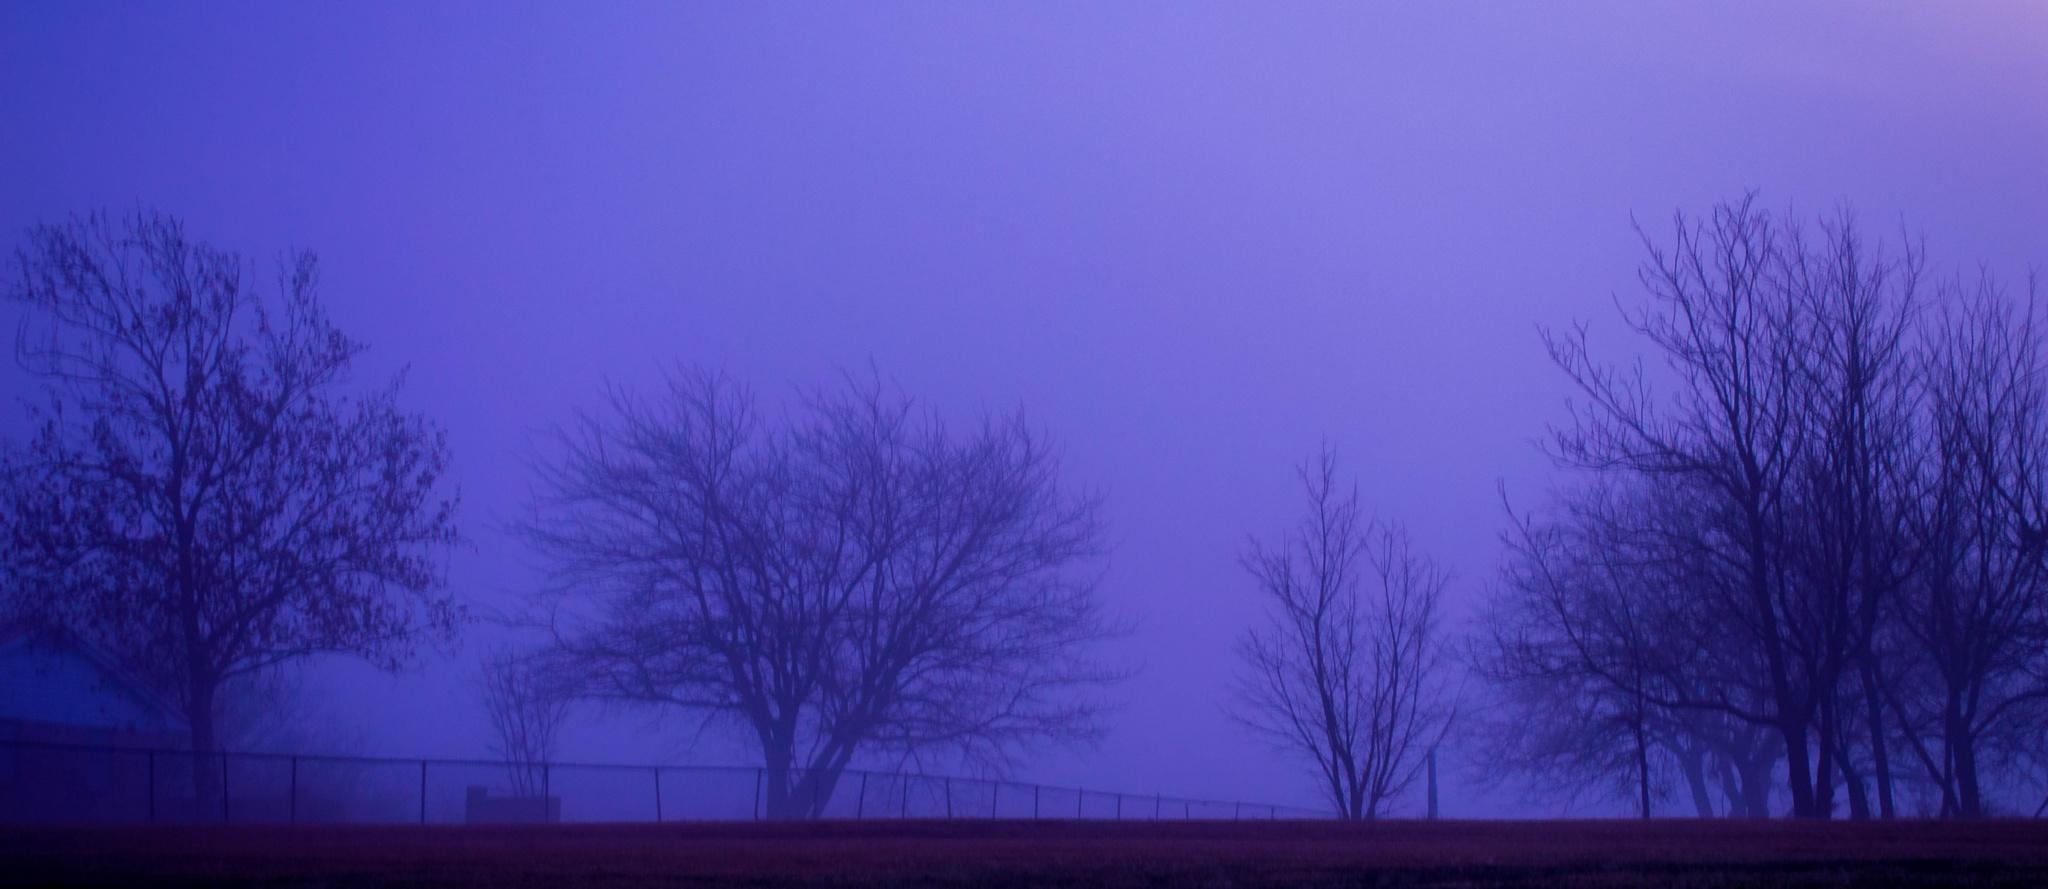 Shadows & fog, Treeline by kenny.peters